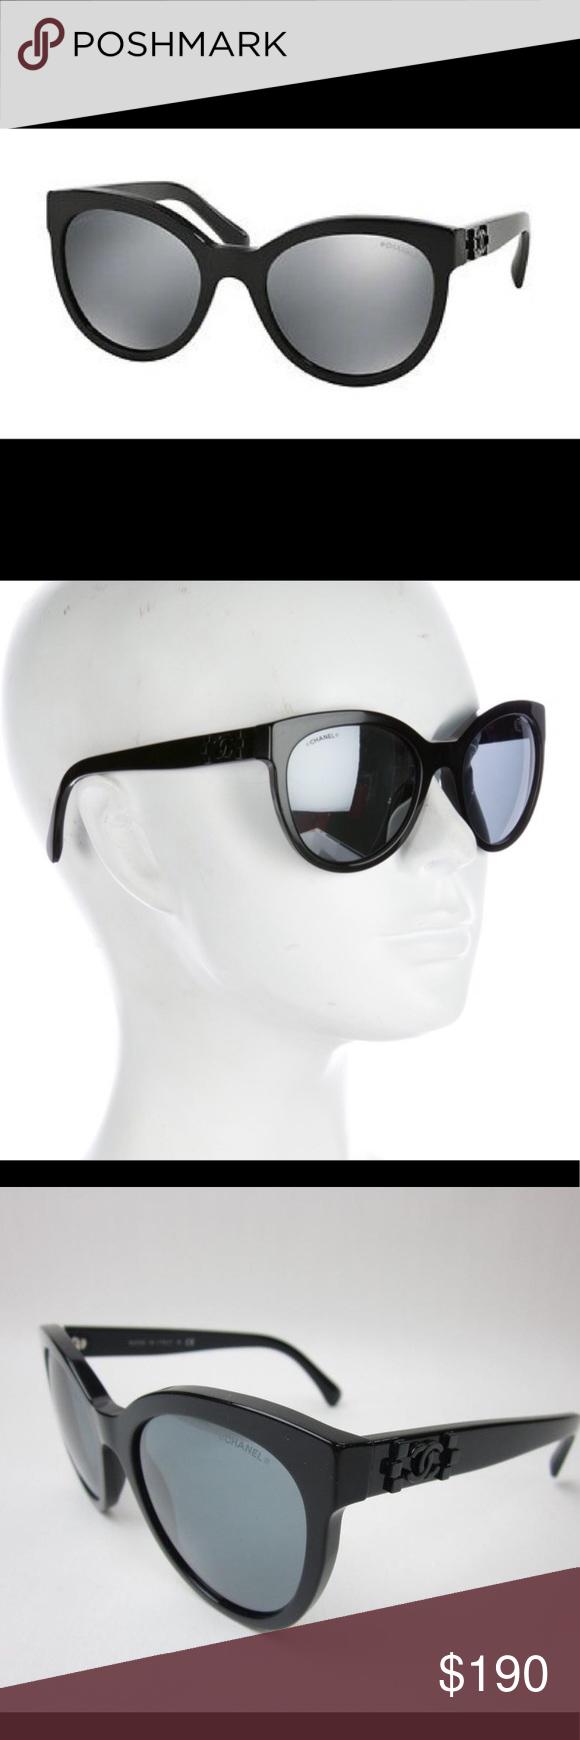 7223ba265c79e Chanel Le Boy Brick Sunglasses Chanel Le Boy Brick Sunglasses Black frame